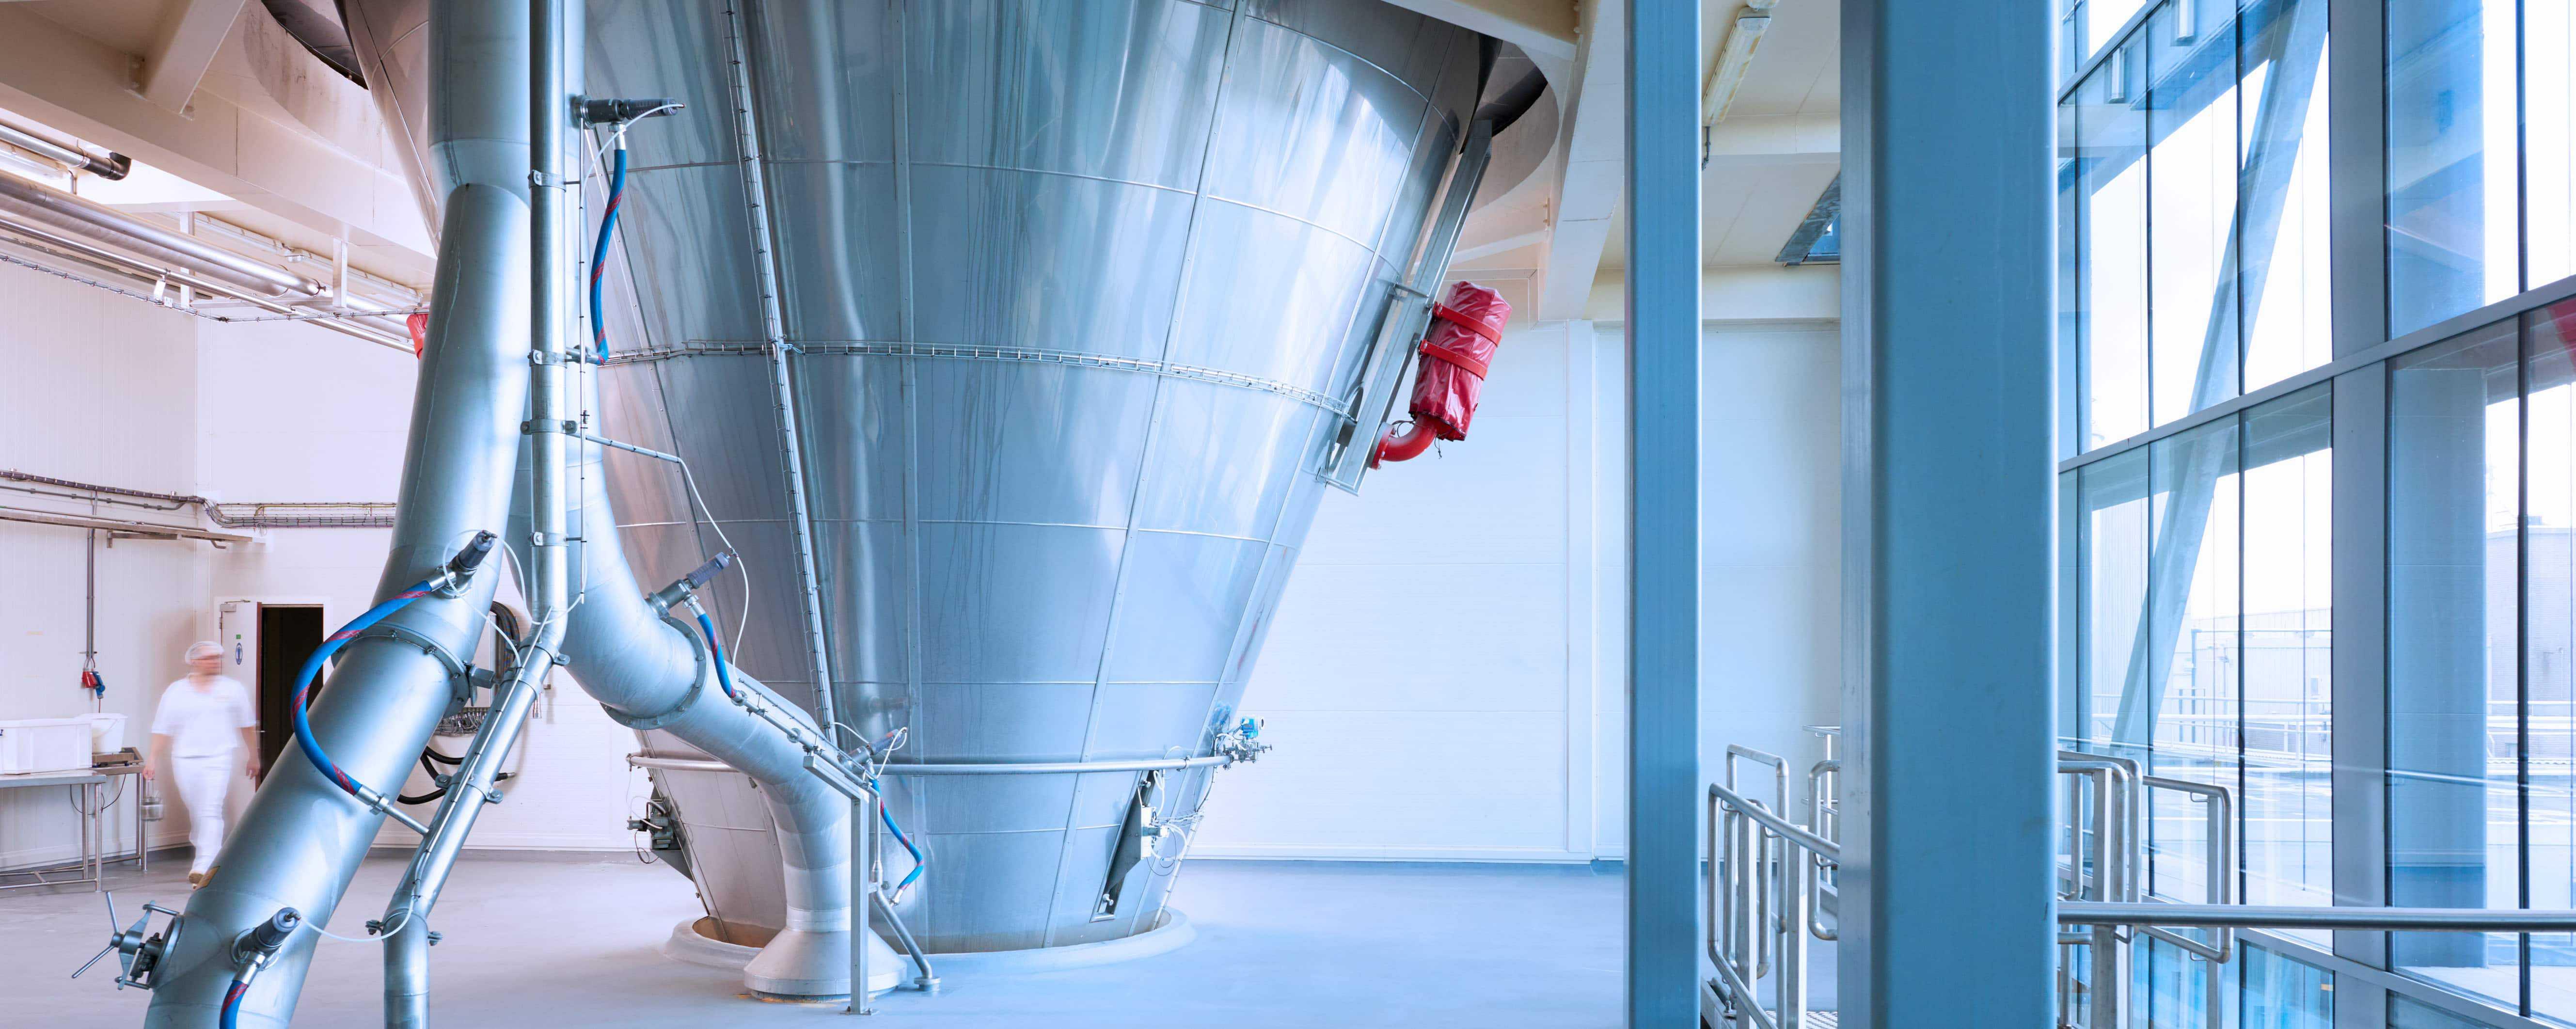 milk-powder-dairy-processing